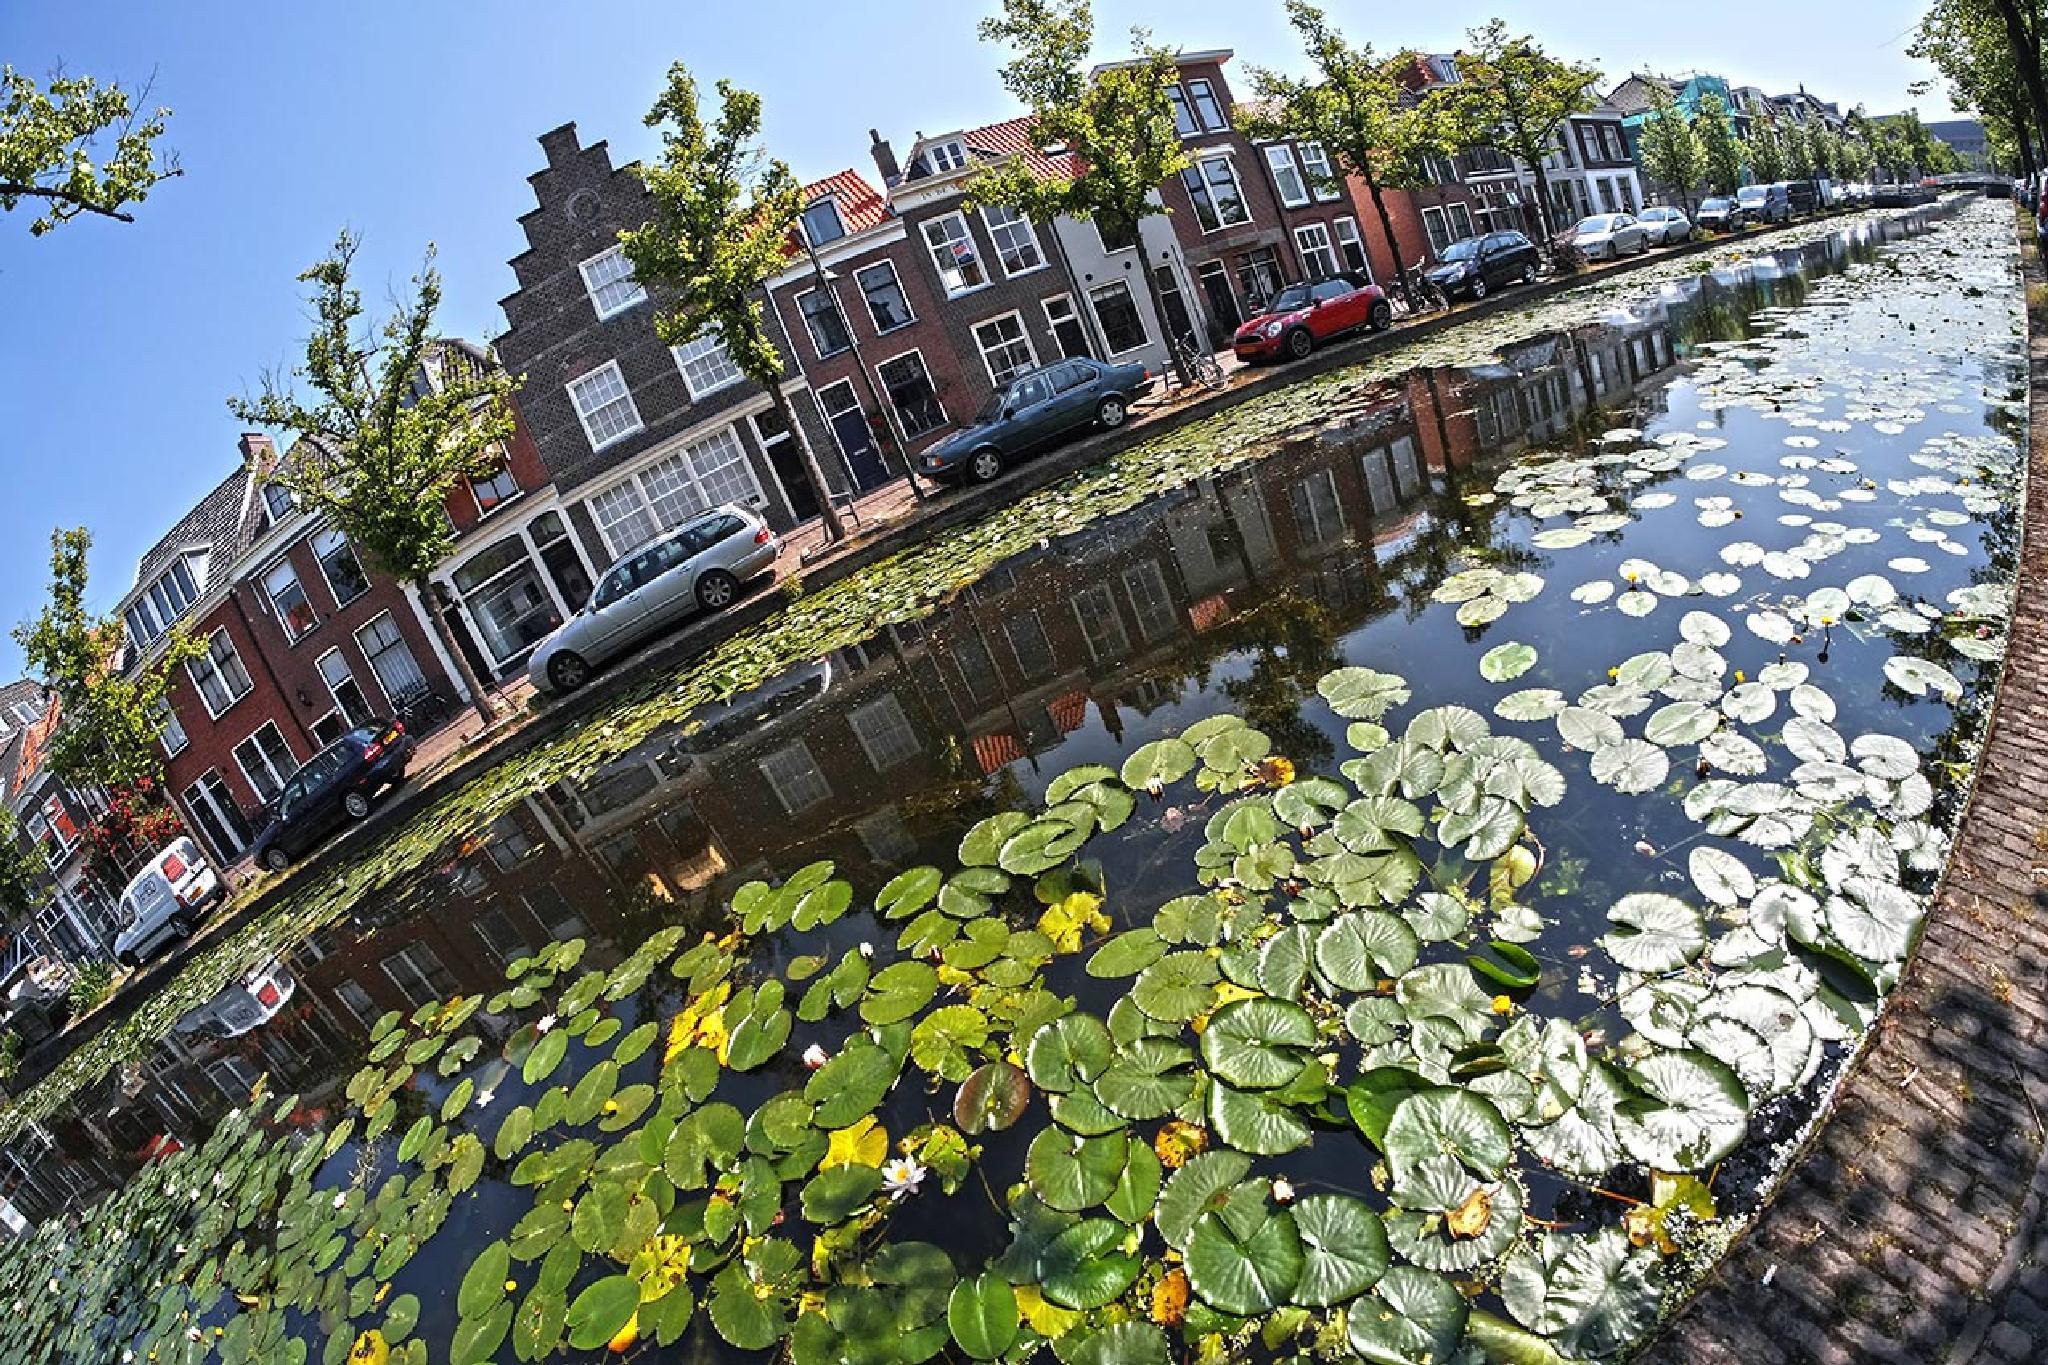 Delft, Holland by David Solodar